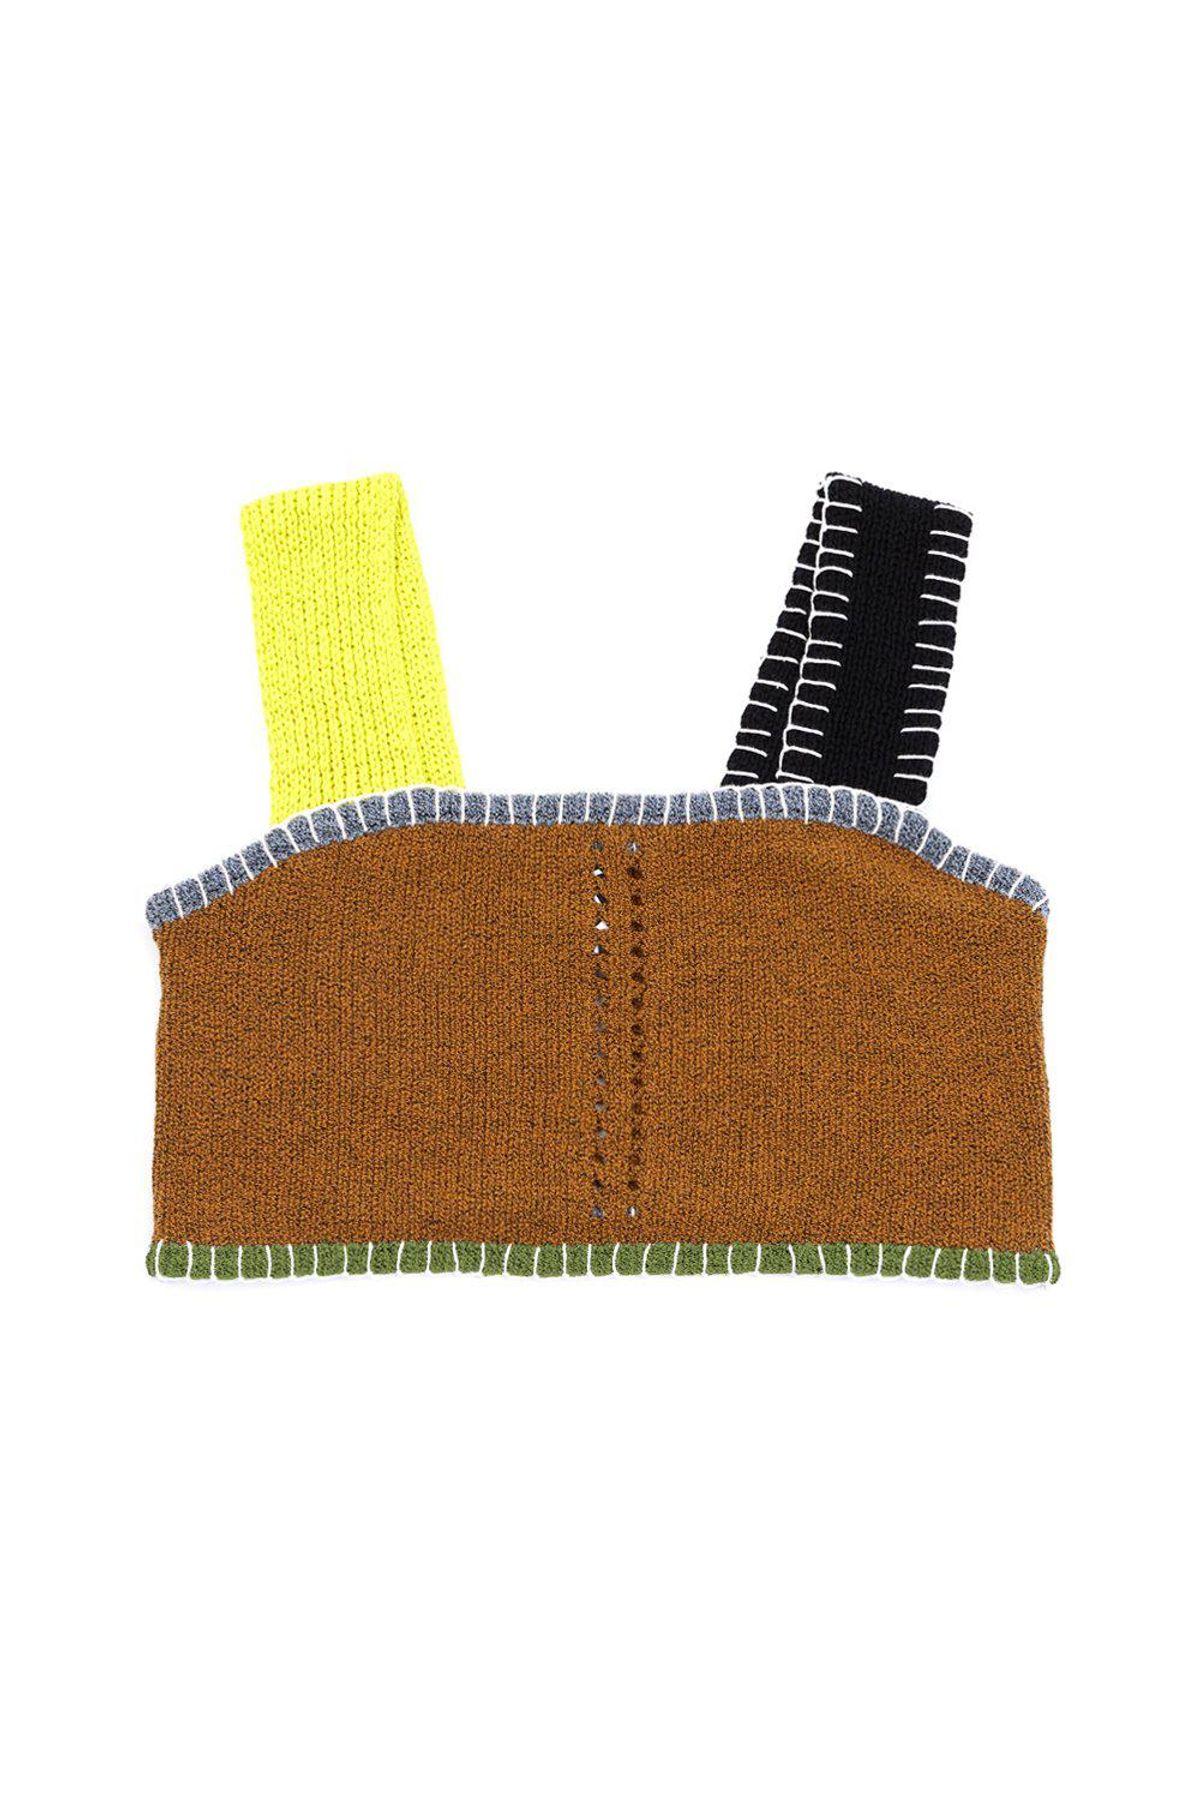 yanyan tweedle crop top in ochre tweed